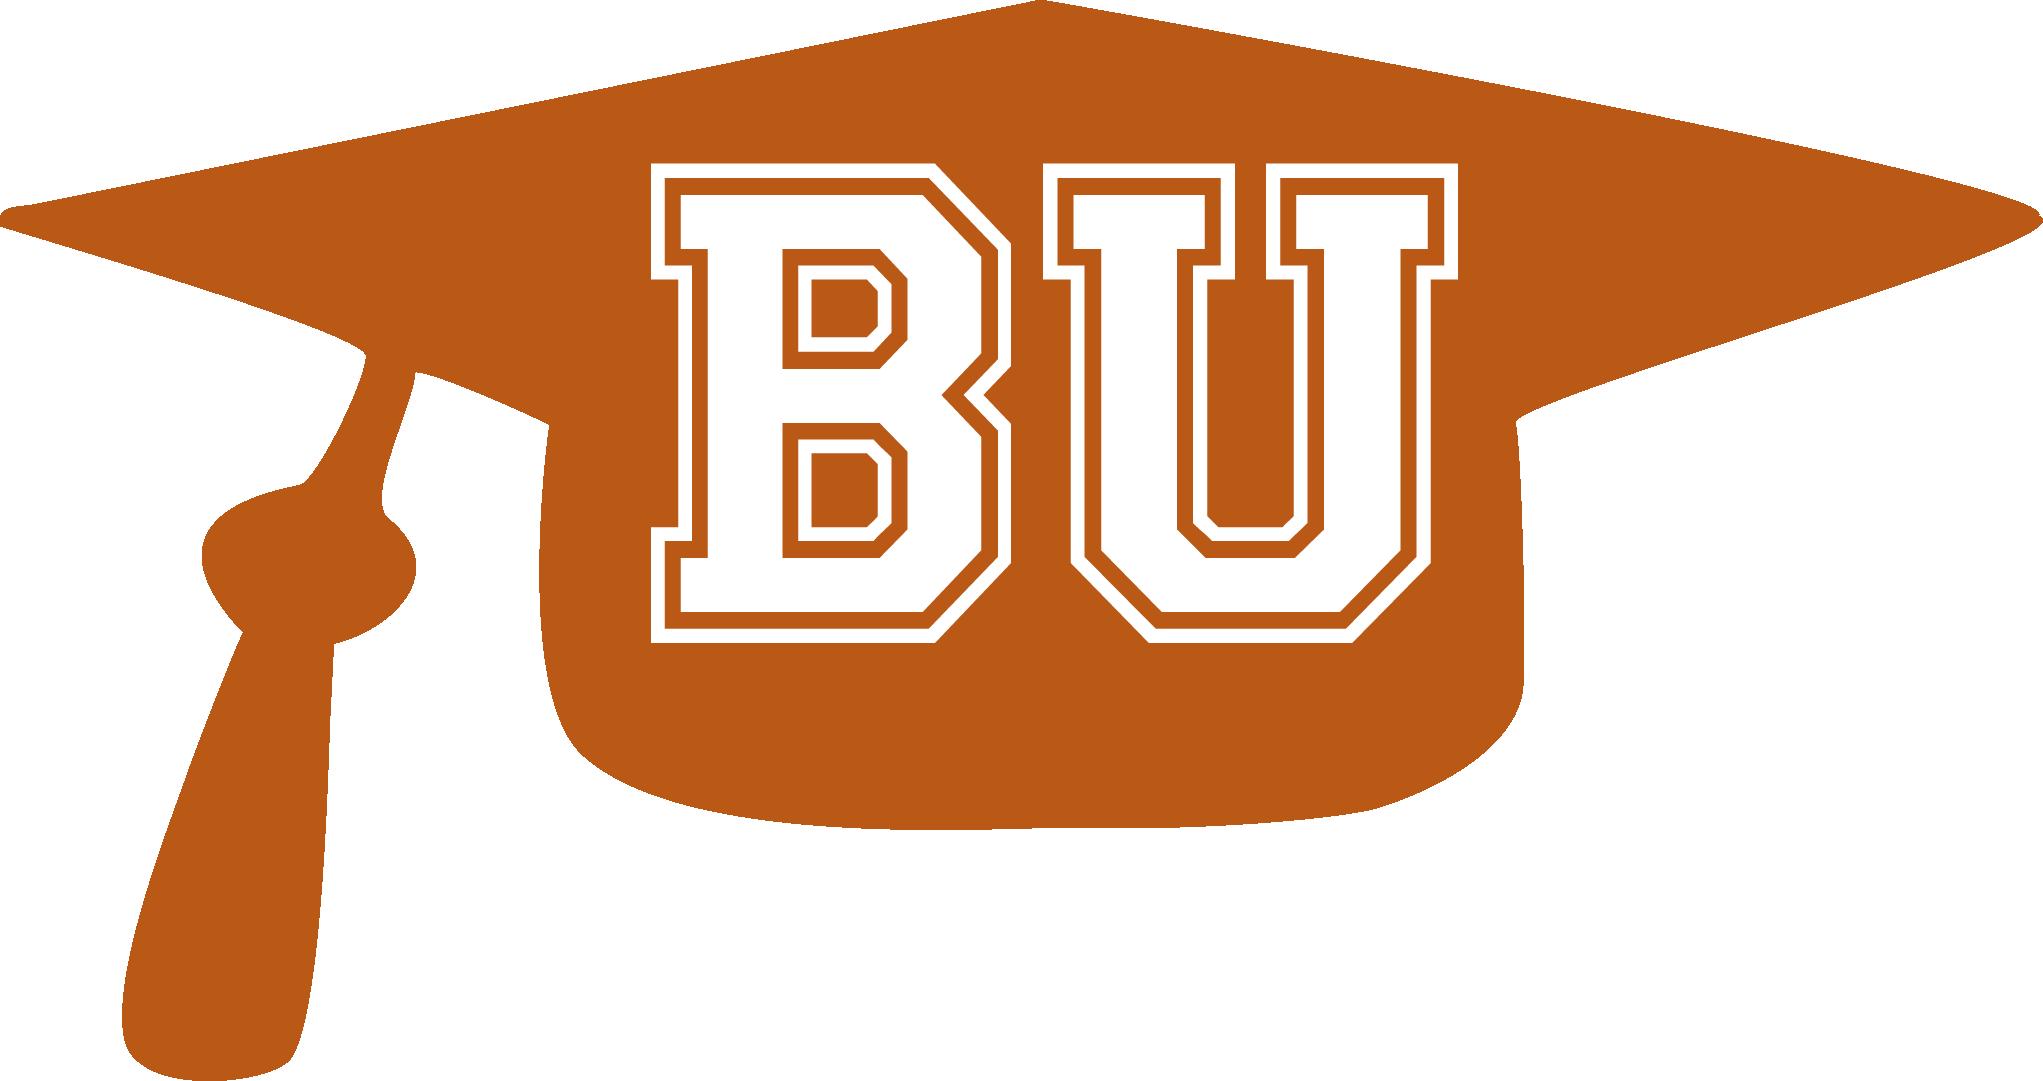 Teach a Course at BU 2015 « Bethel University